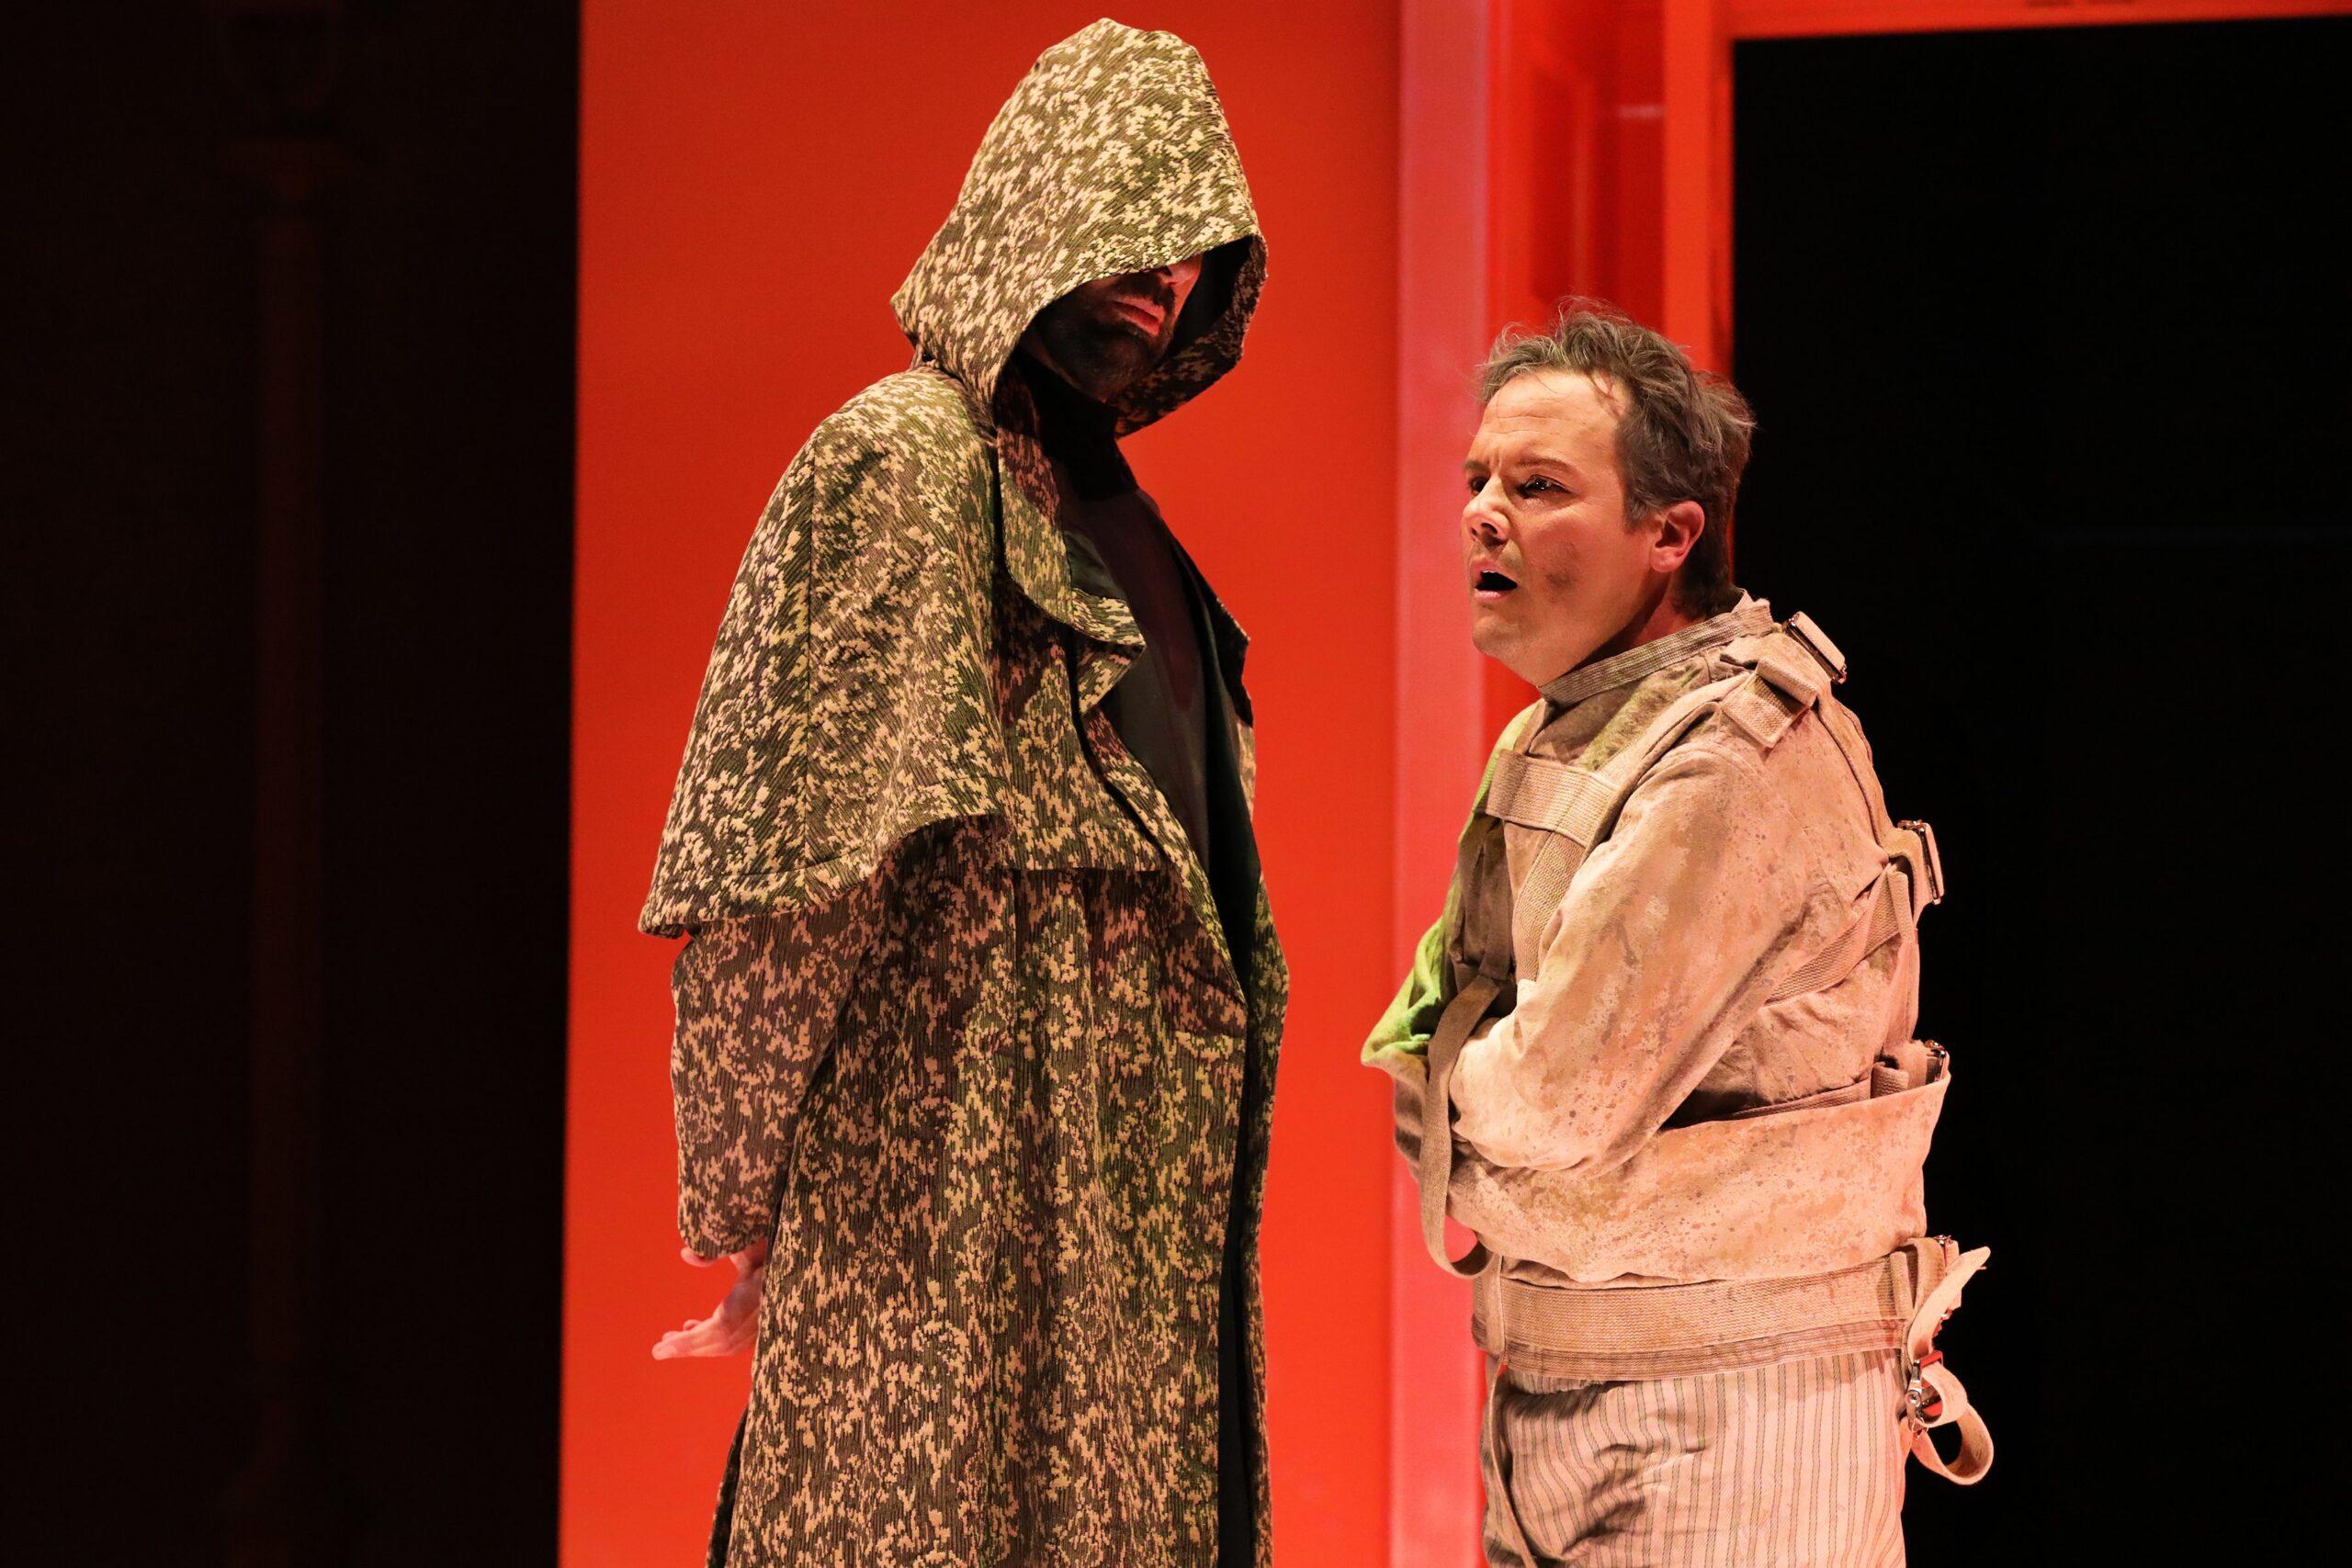 Matt Boehler (Van Helsing), David Portillo (Jonathan Harker). Photo Credit: Curtis Brown for the Santa Fe Opera, 2021